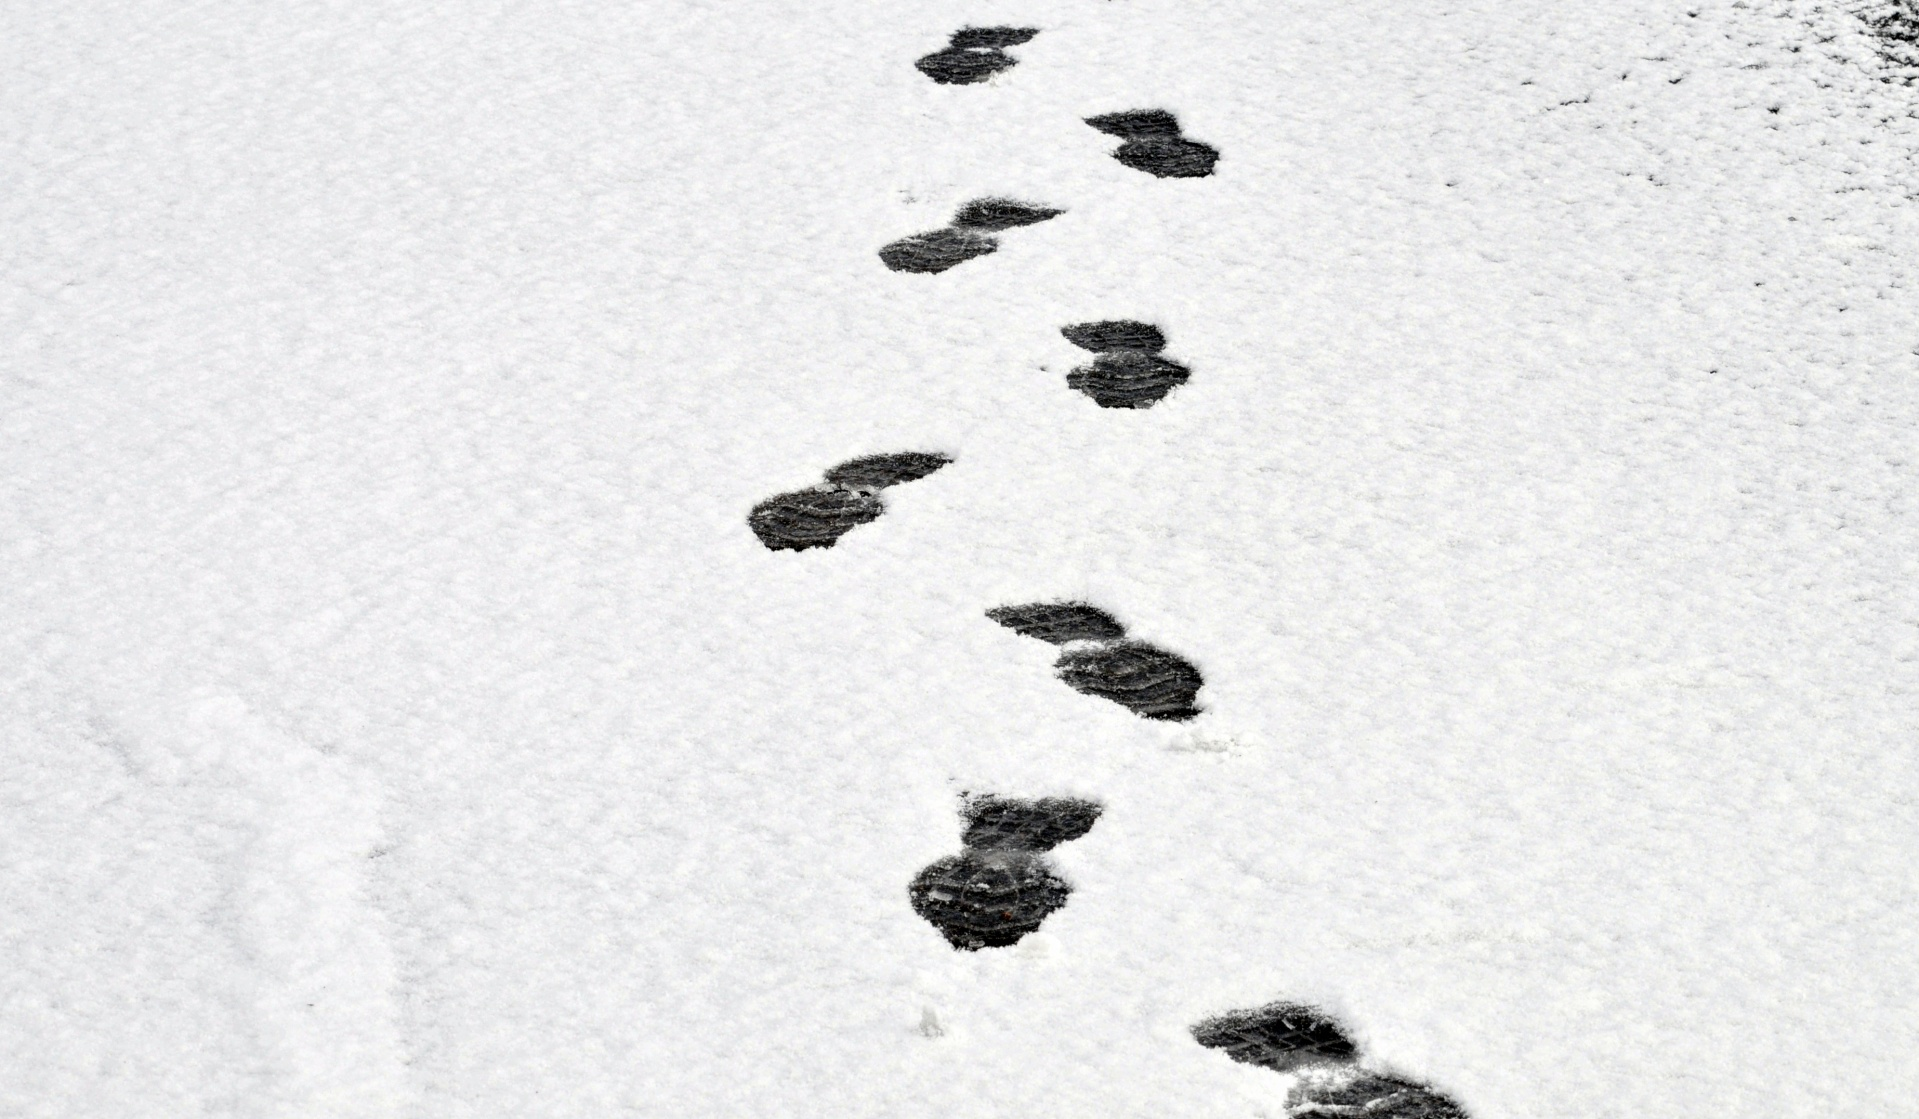 Snow Tracks Clipart